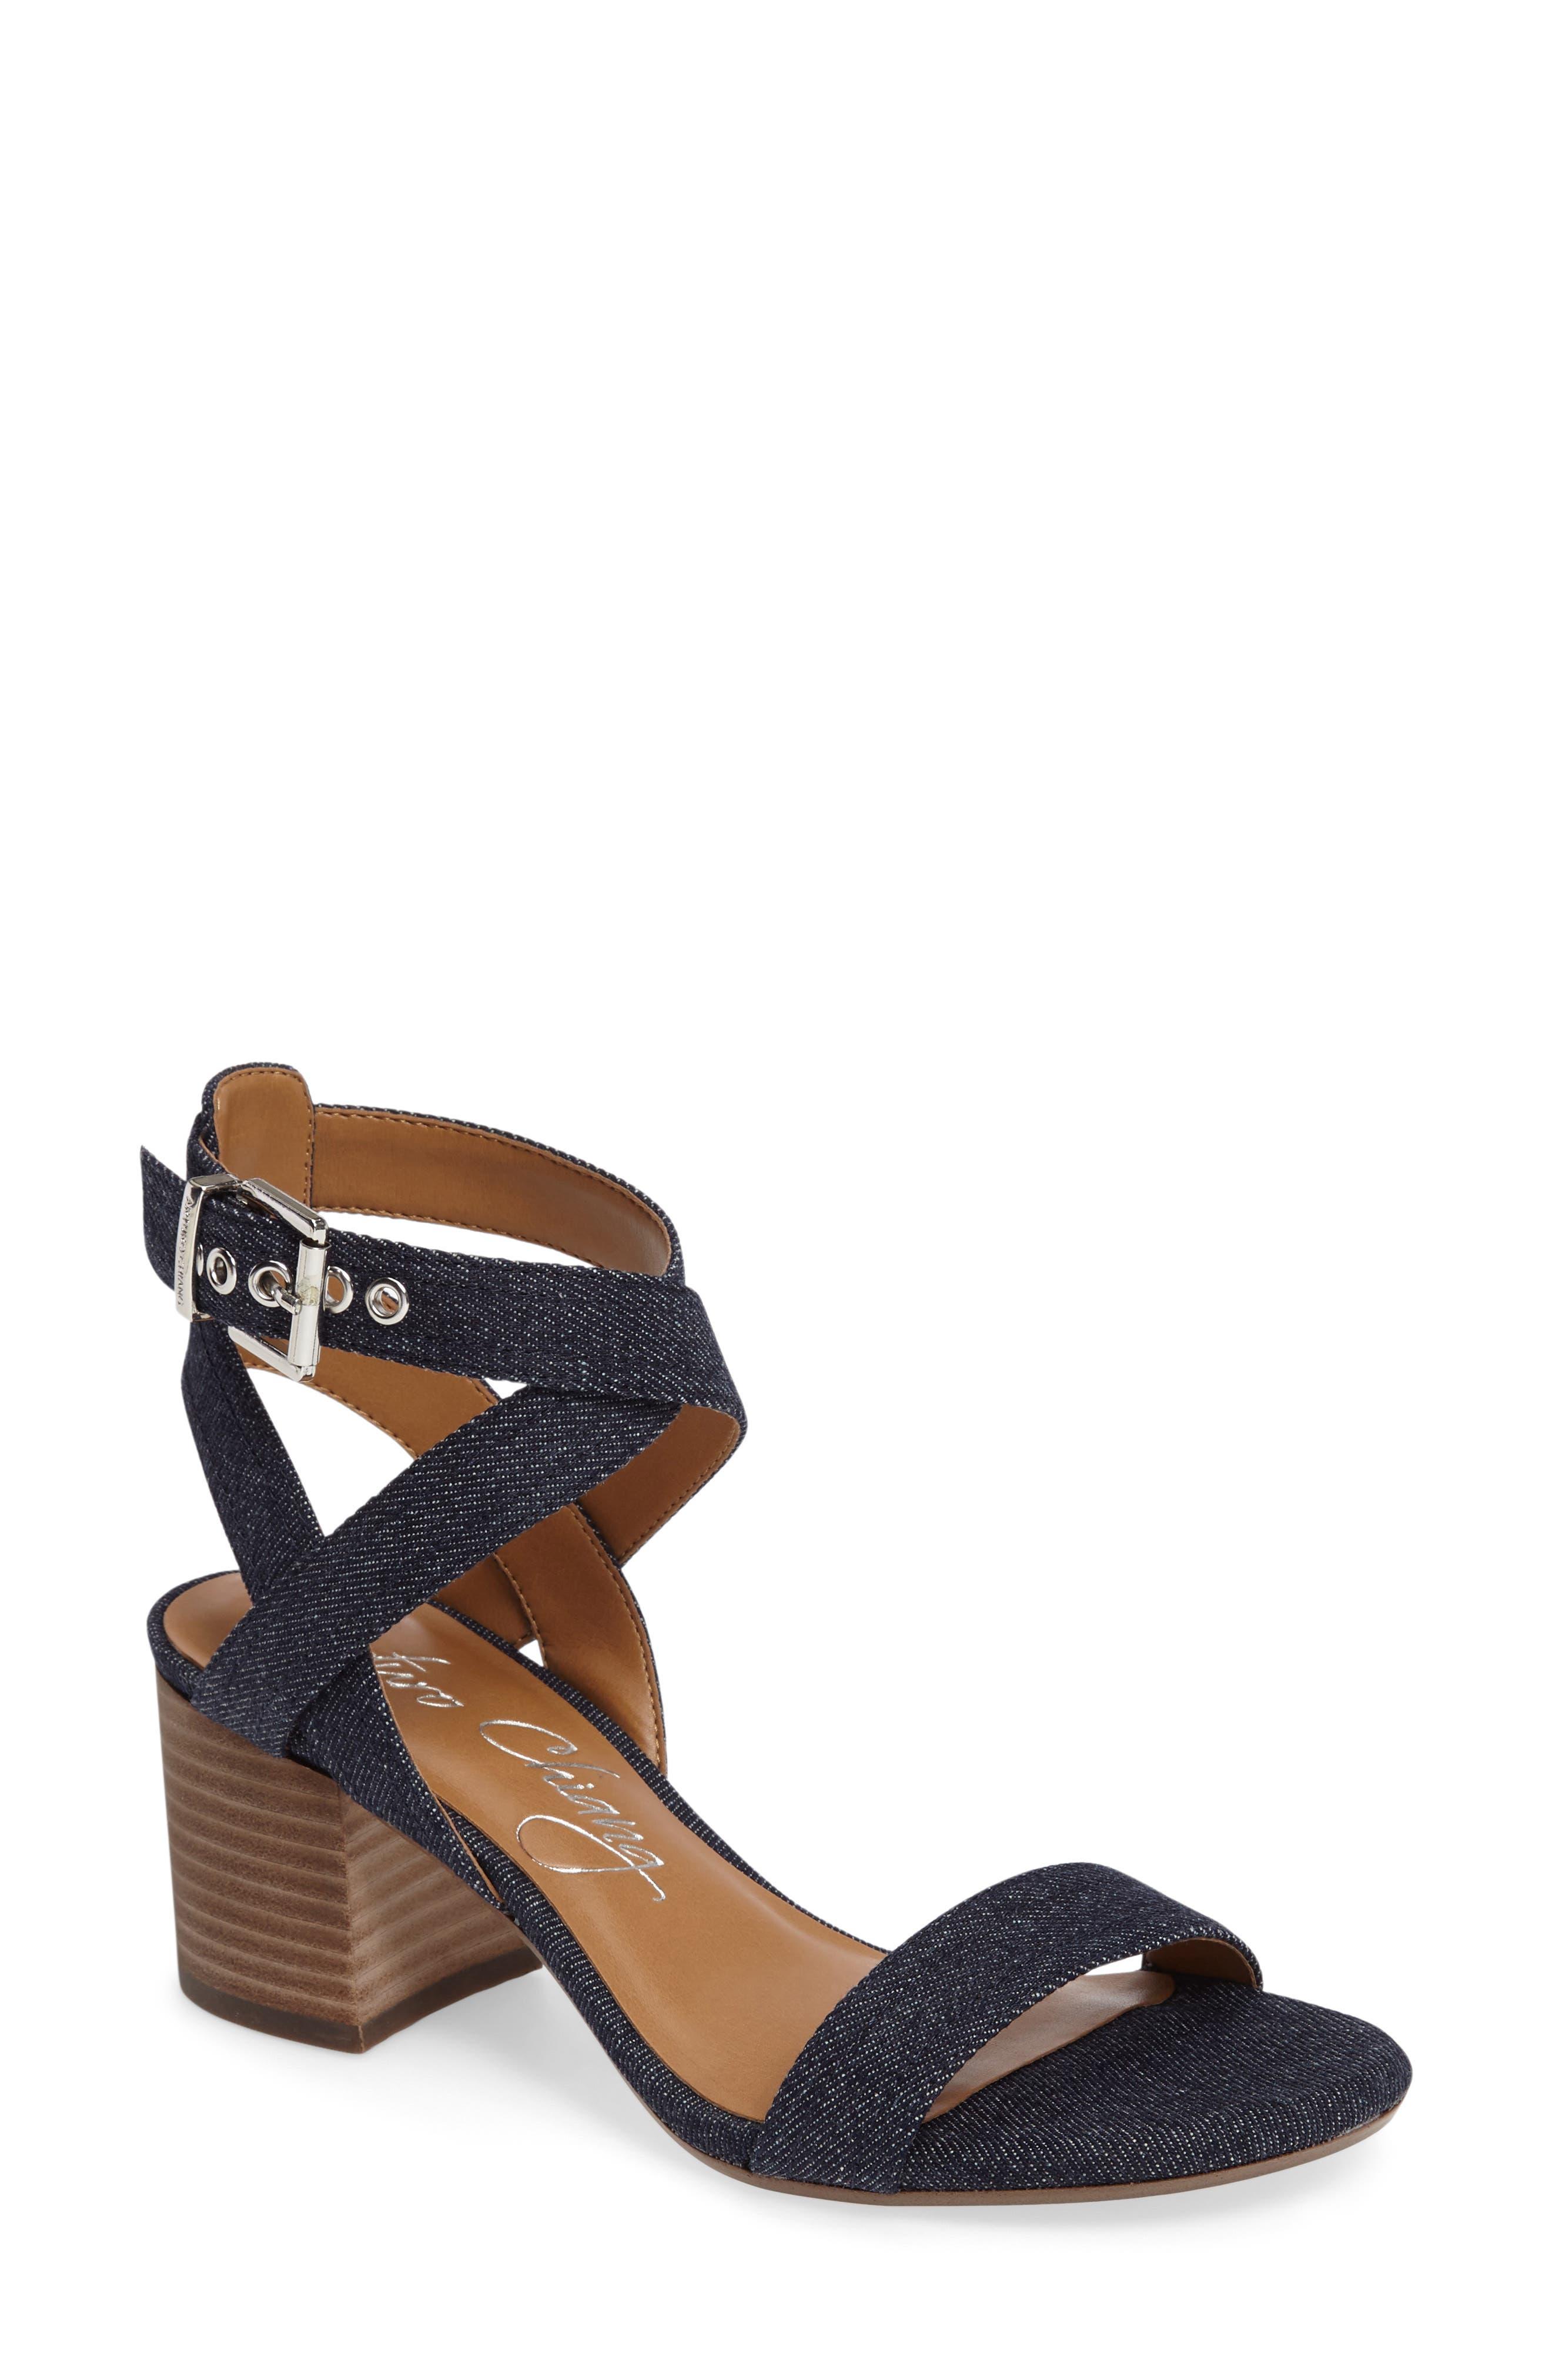 ARTURO CHIANG Hammil Block Heel Sandal